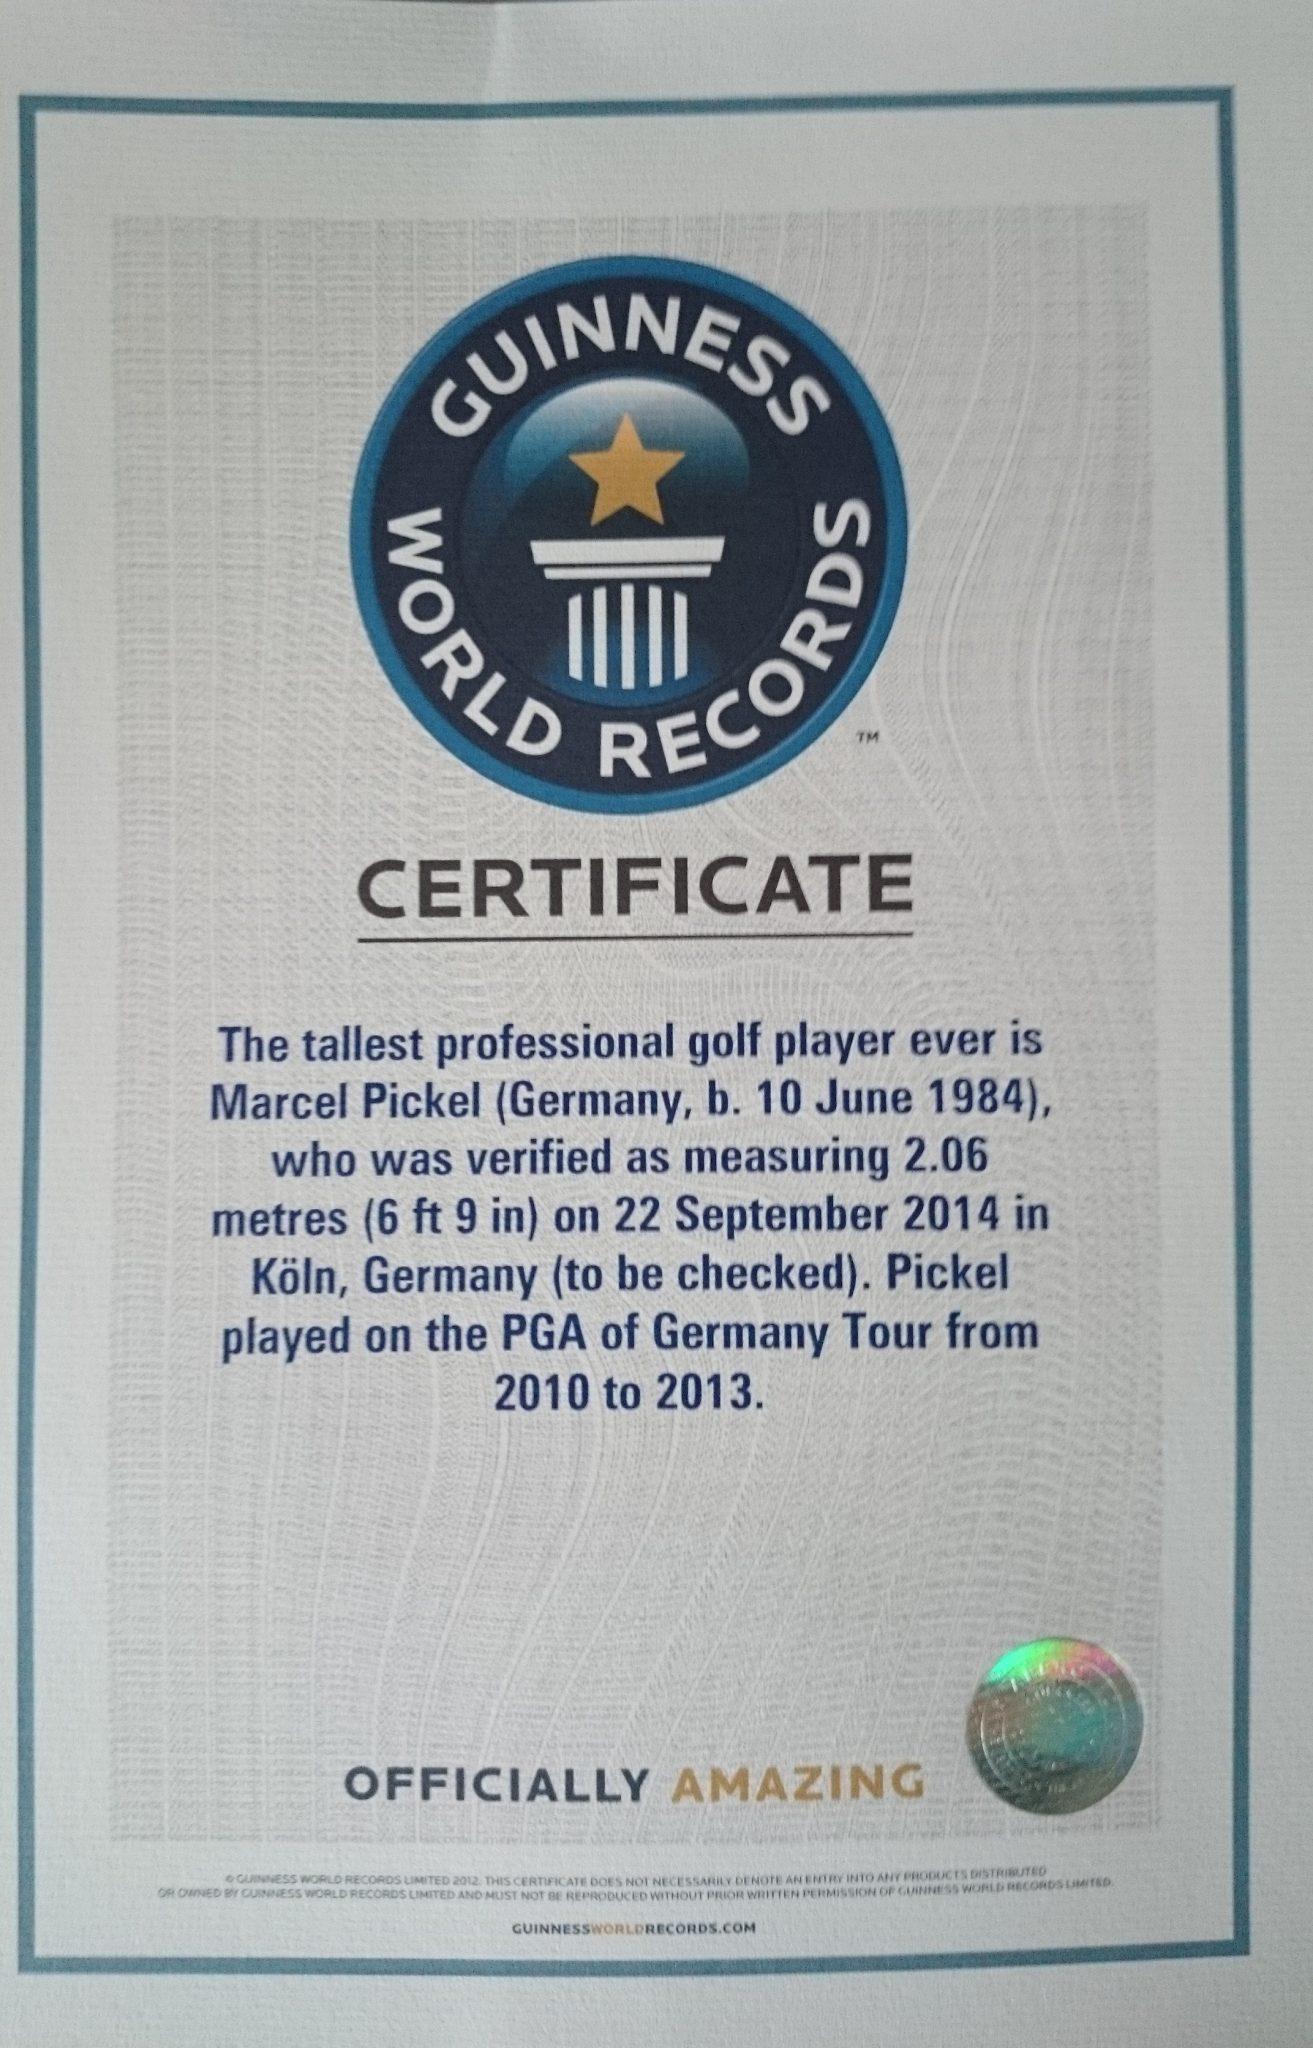 größter golf professionell Golf Rekord: Der größte Golf Professional